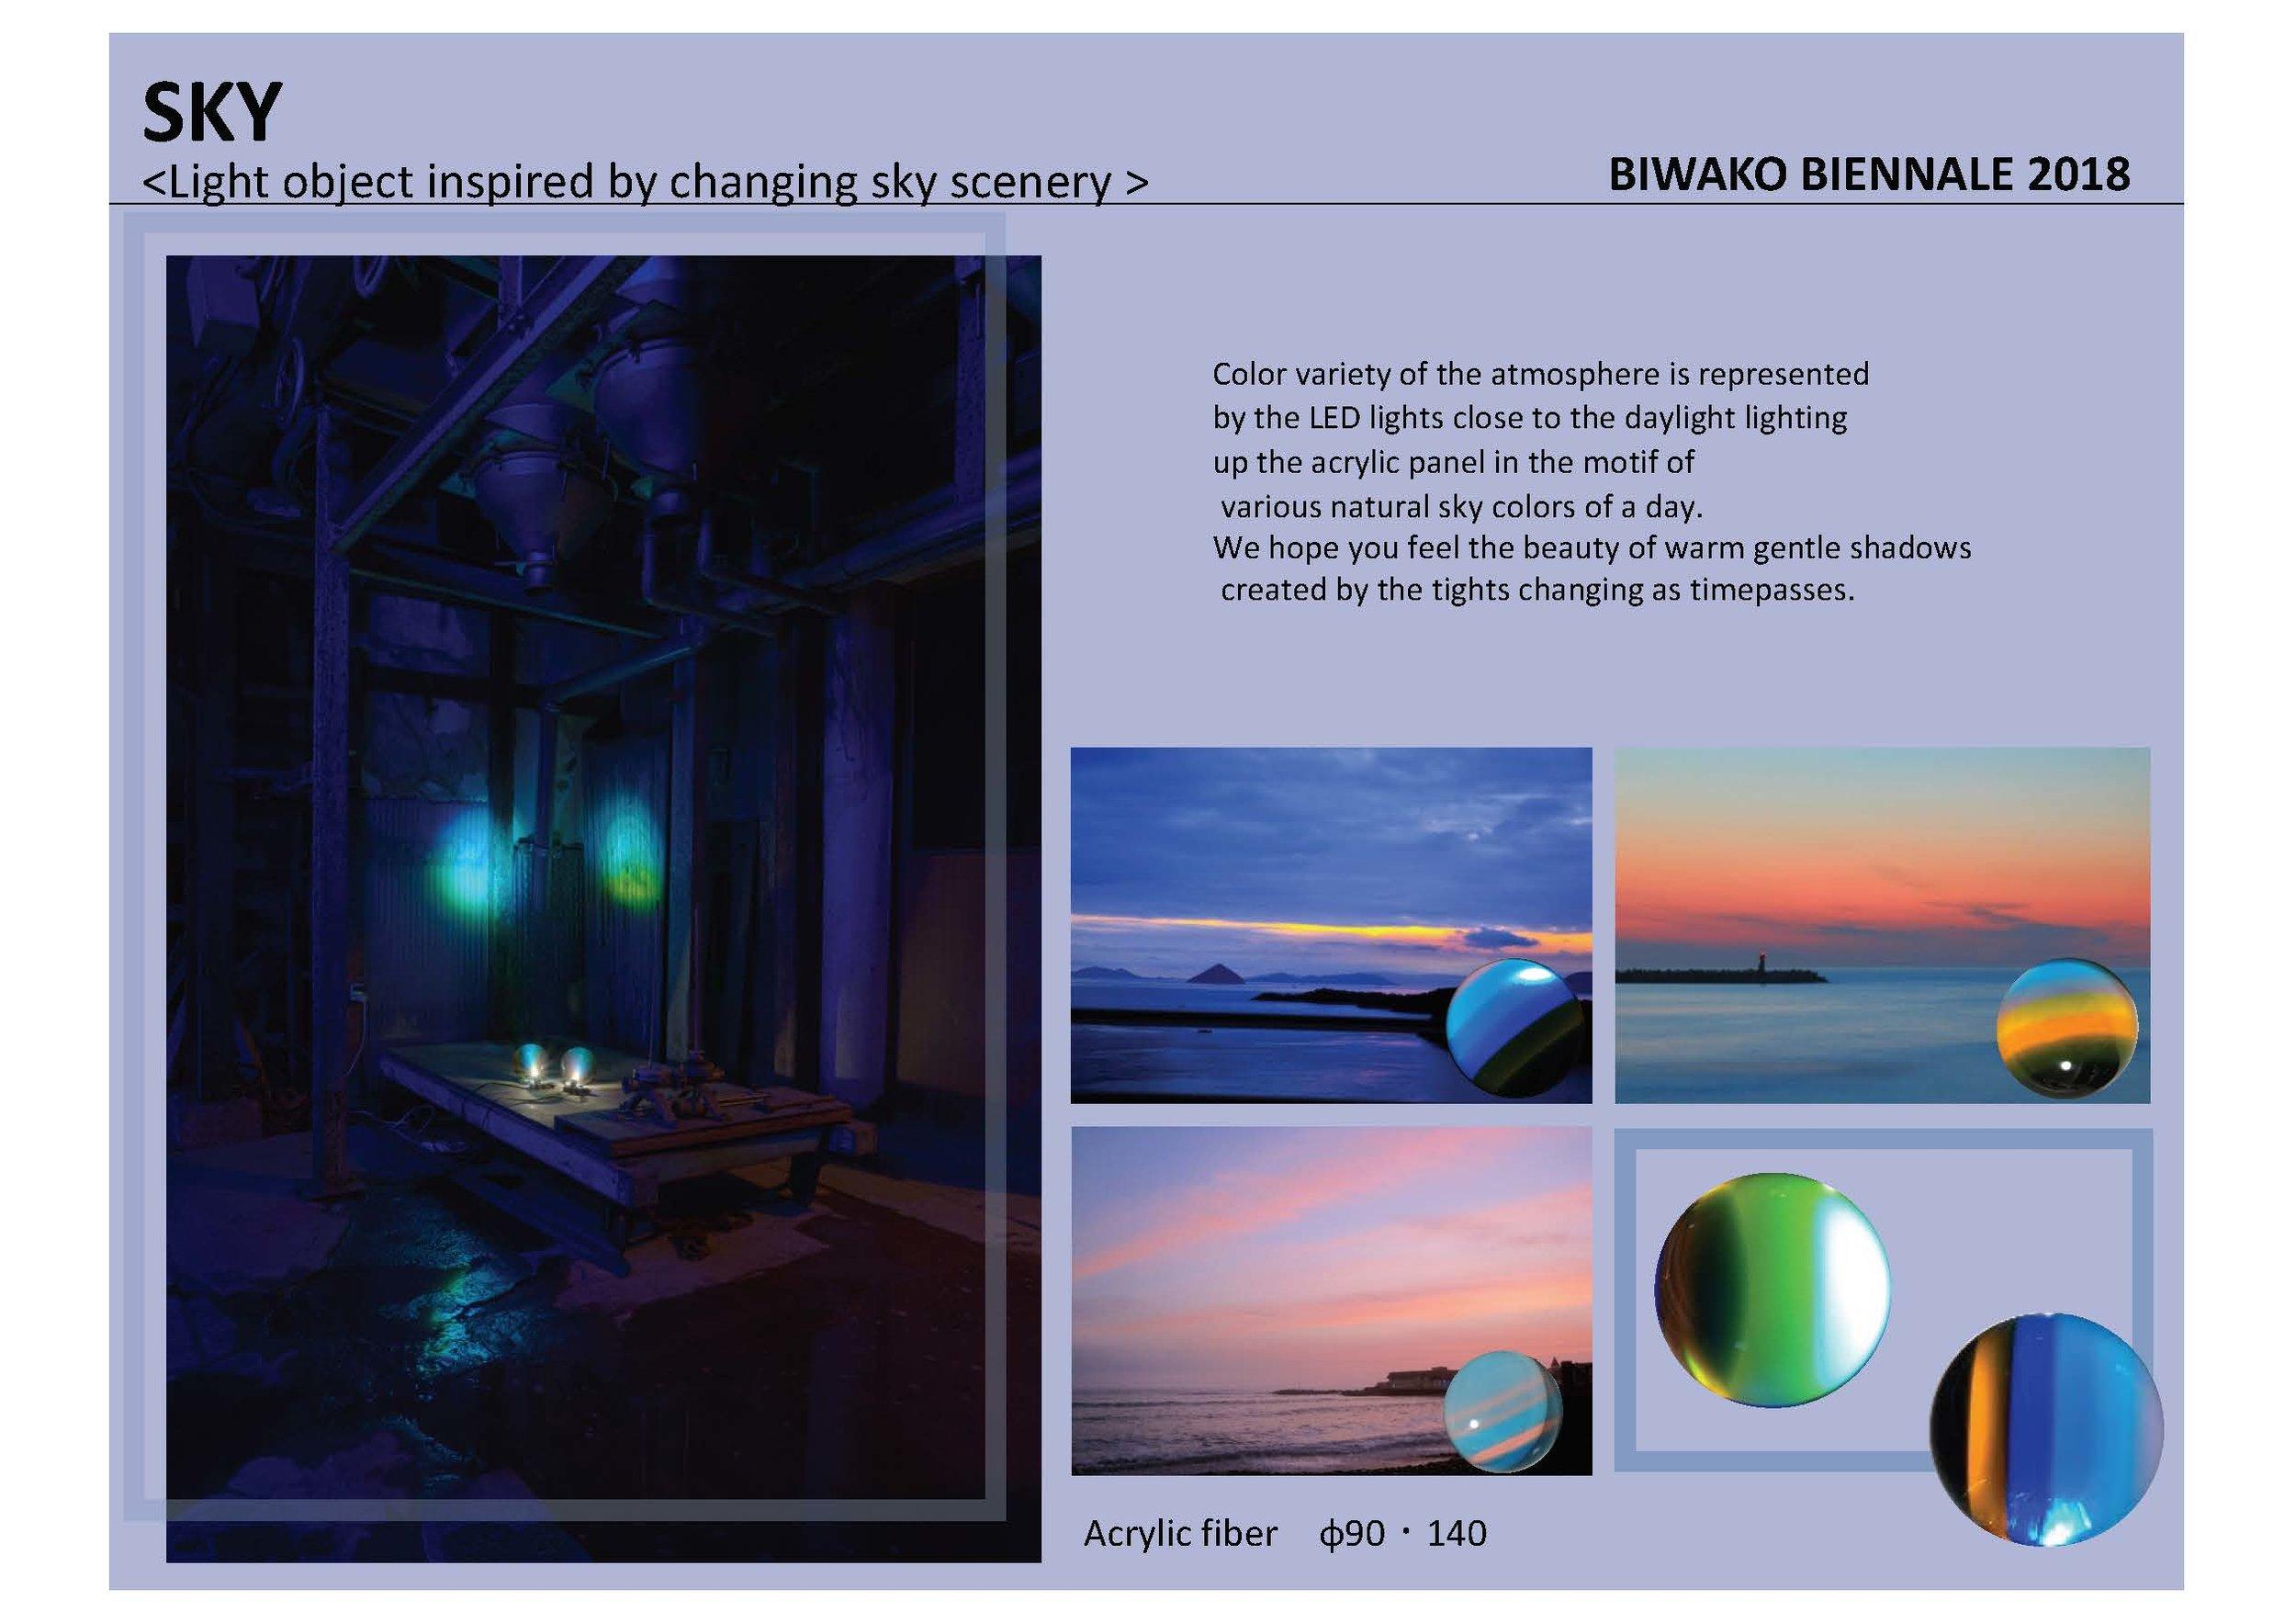 BIWAKO BIENNALE 2019 - Design by: Yoko & Miki OUCHIInterior Division: Visual Pop-up (Lighting Art)Website: http://energyfield.org/biwakobiennale/en/about/